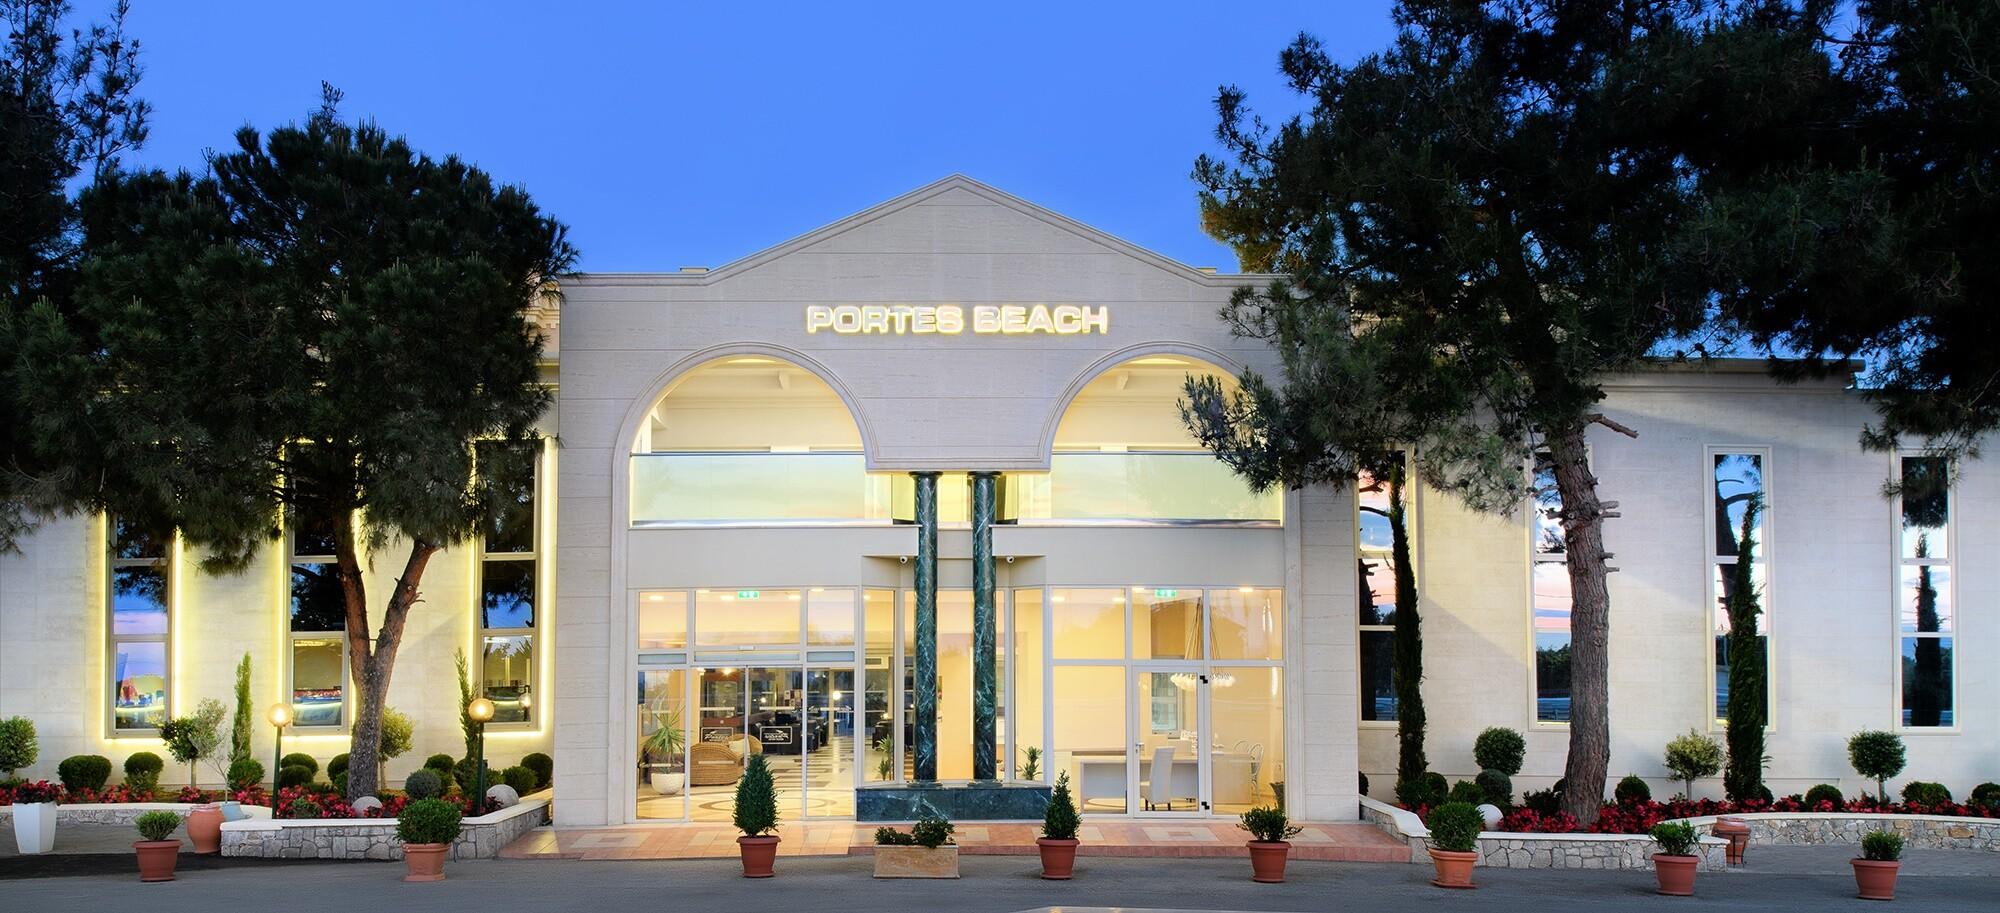 Portes Beach Hotel - вход и рецепция